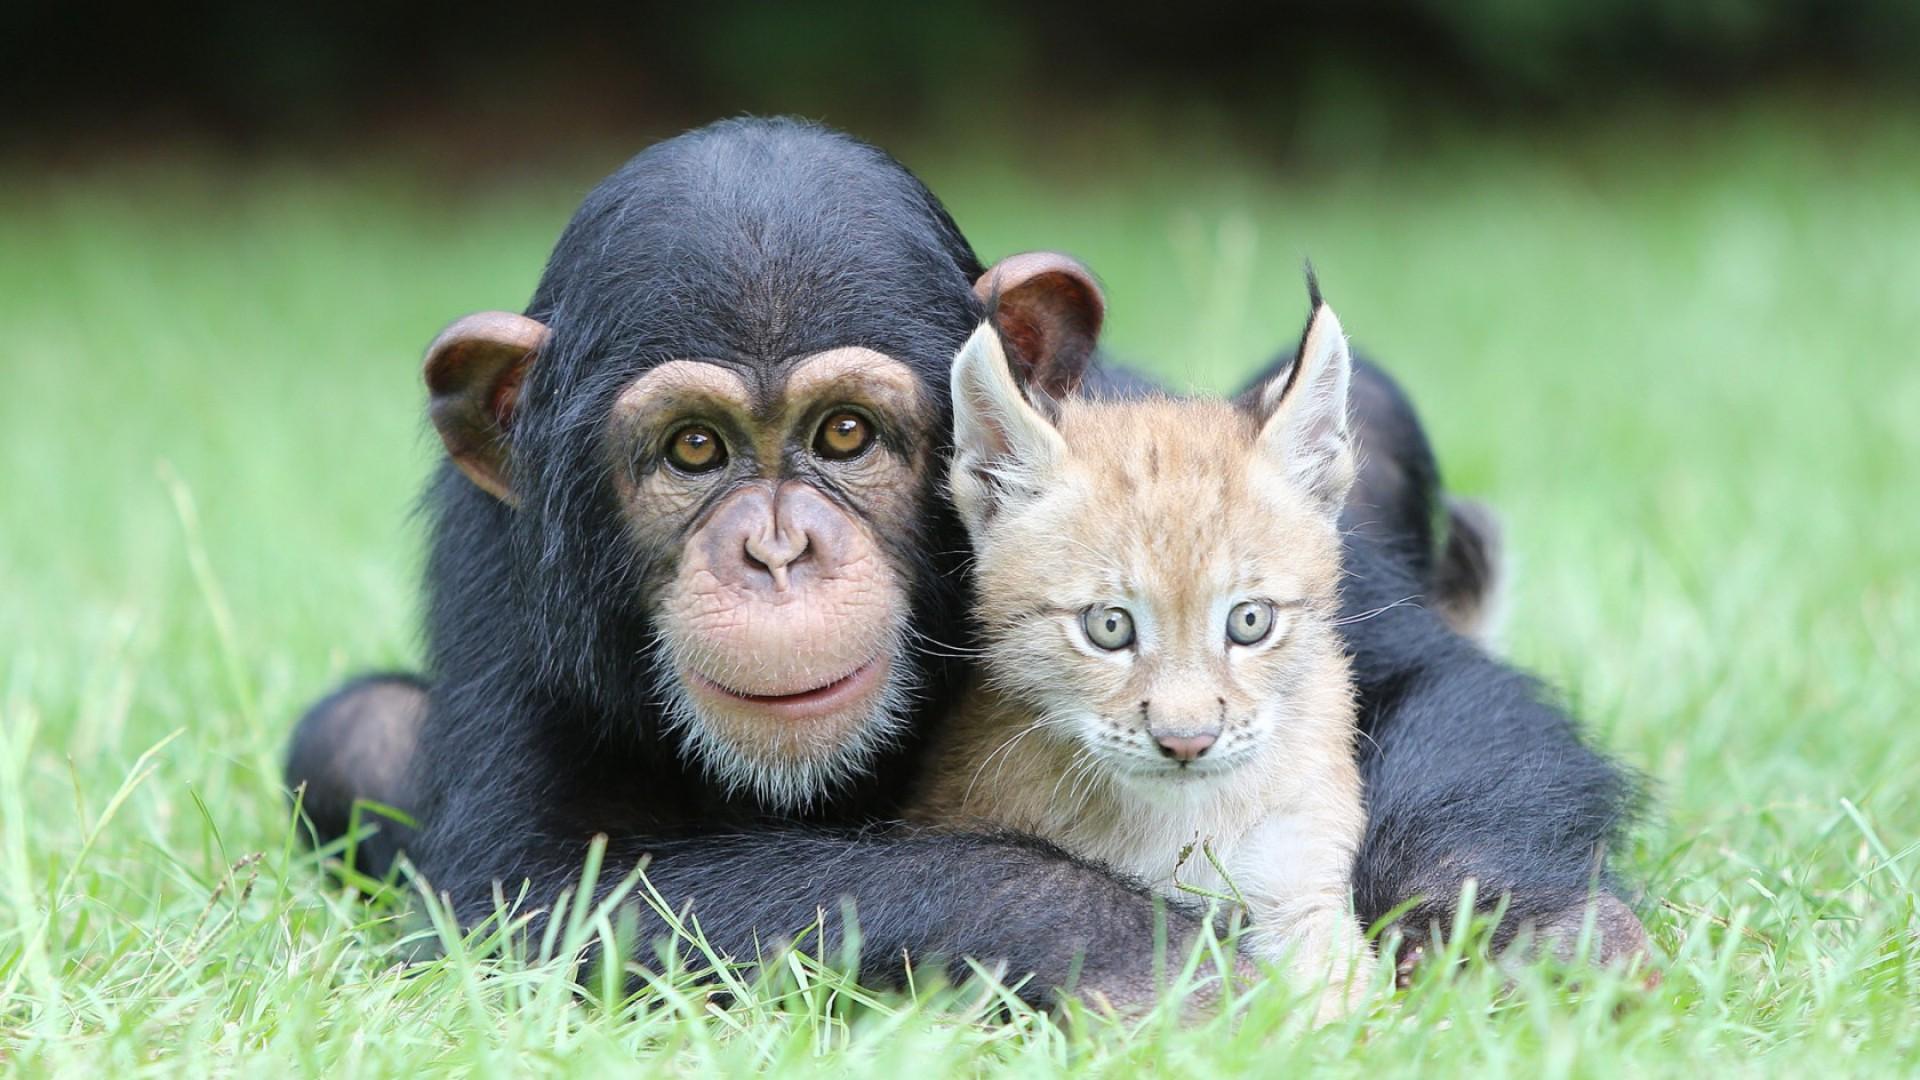 chimpanzees, Lynx, Animals, Nature, Baby Animals, Face ...